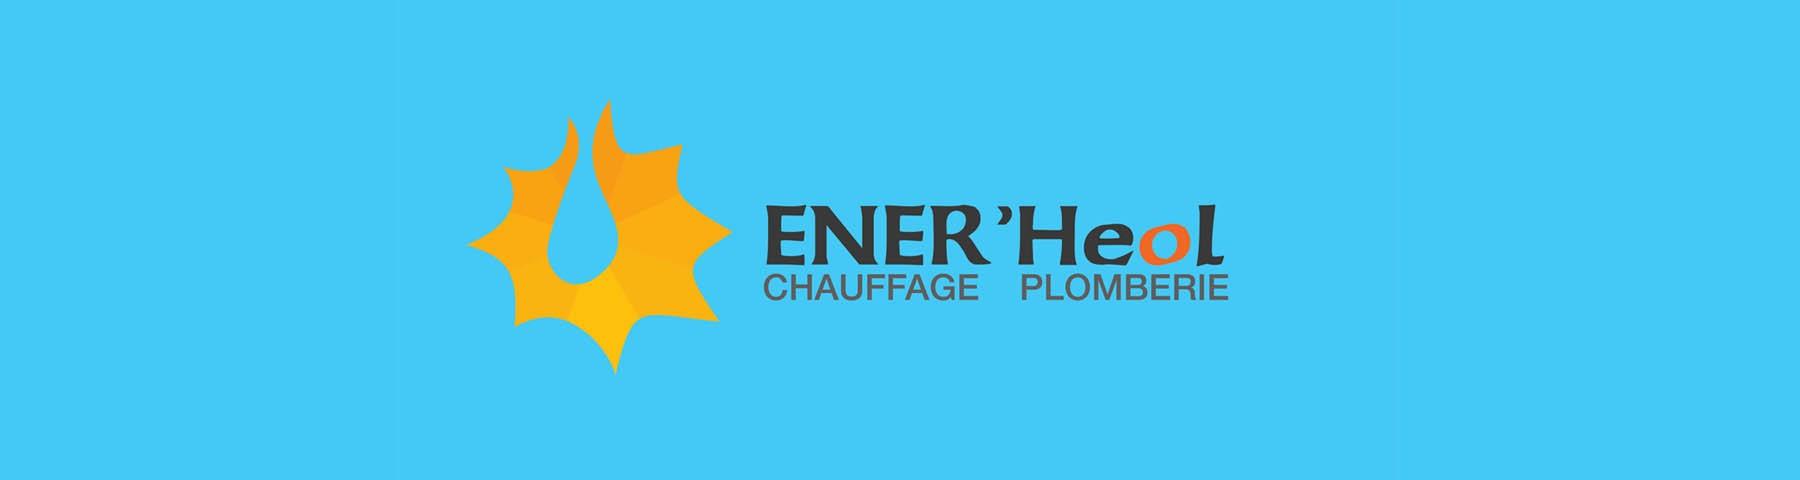 Logo Enerheol.jpg